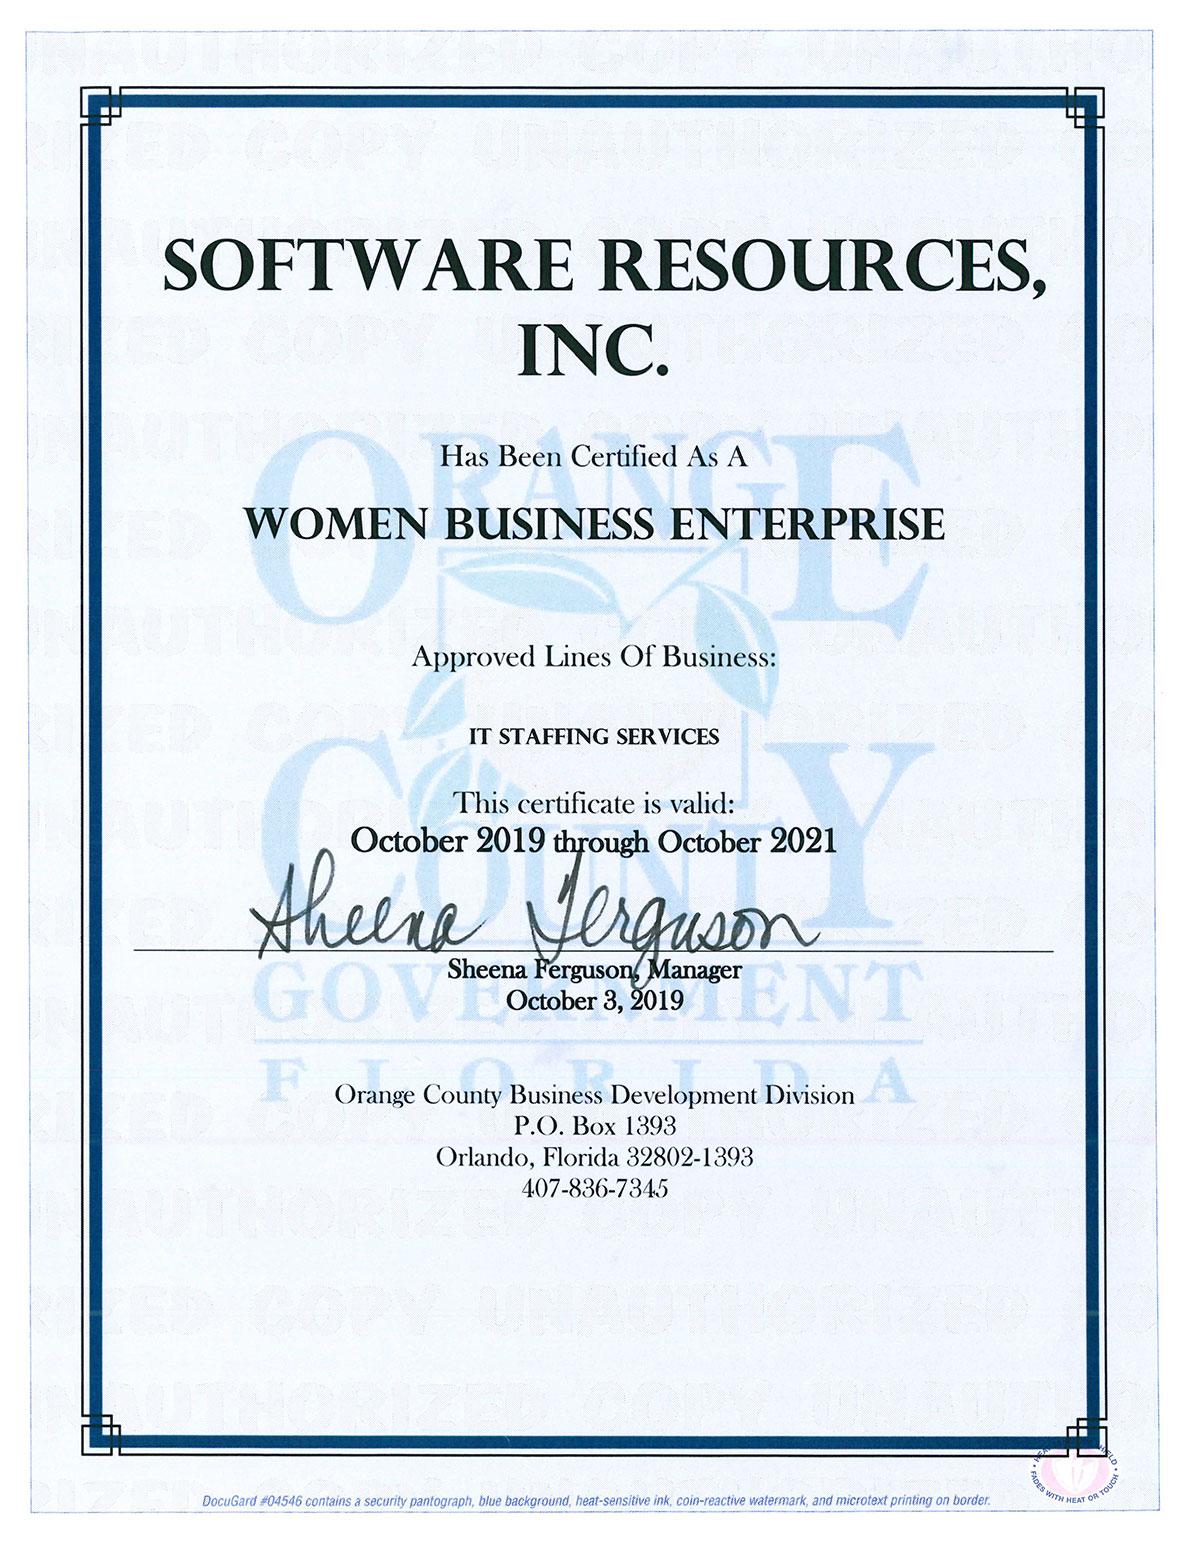 Women Business Enterprise Certificate